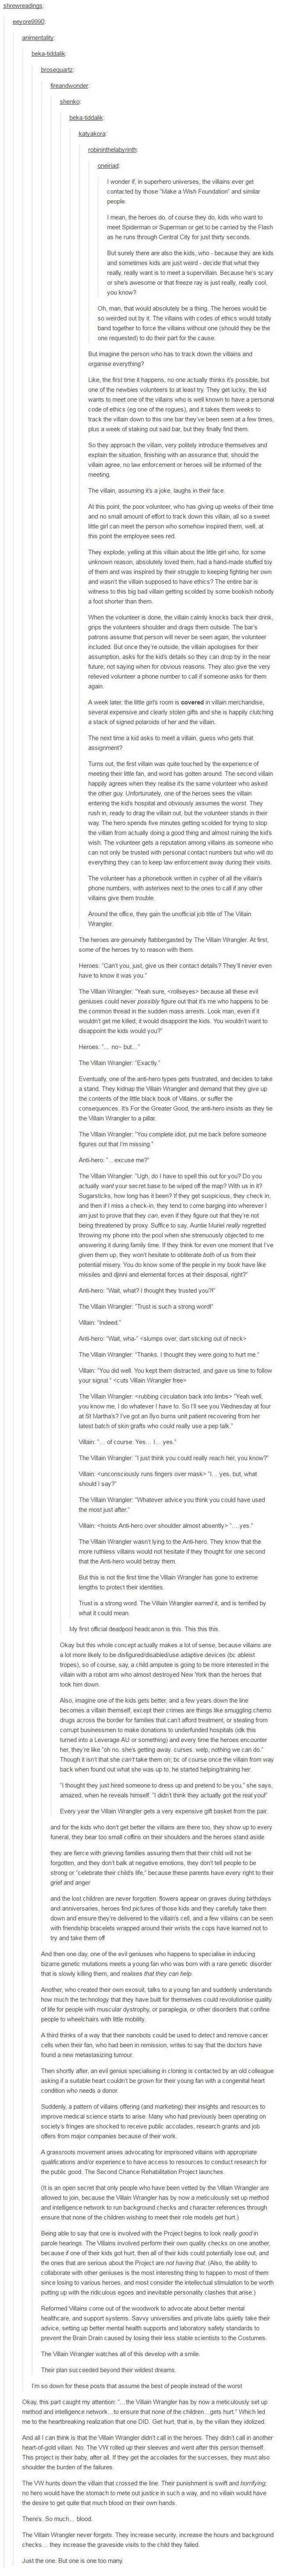 The Villain Wrangler   supervillains post   Writing prompts ...